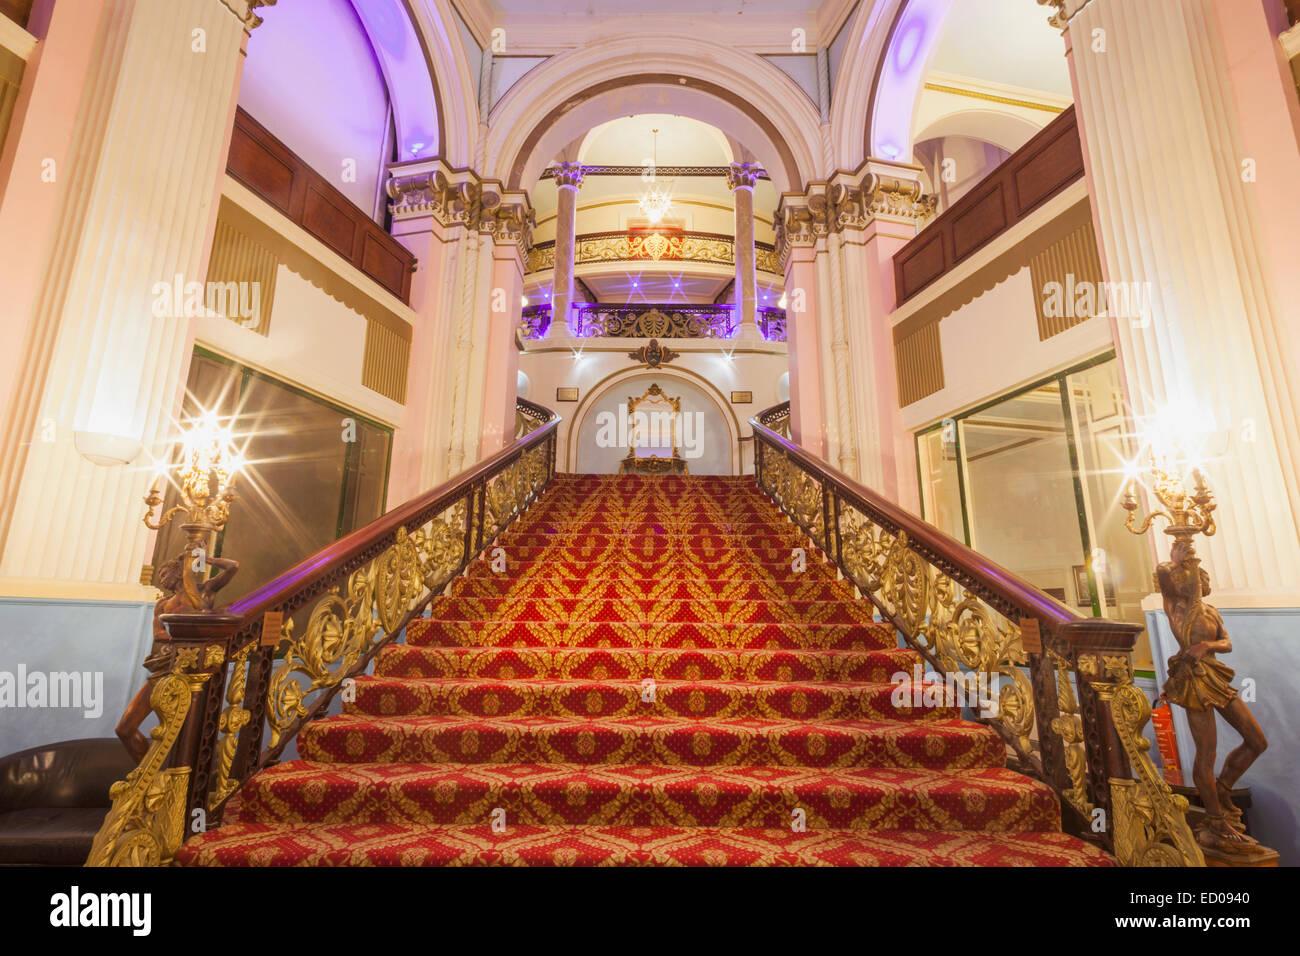 England, Yorkshire, Scarborough, The Grand Hotel, Interior